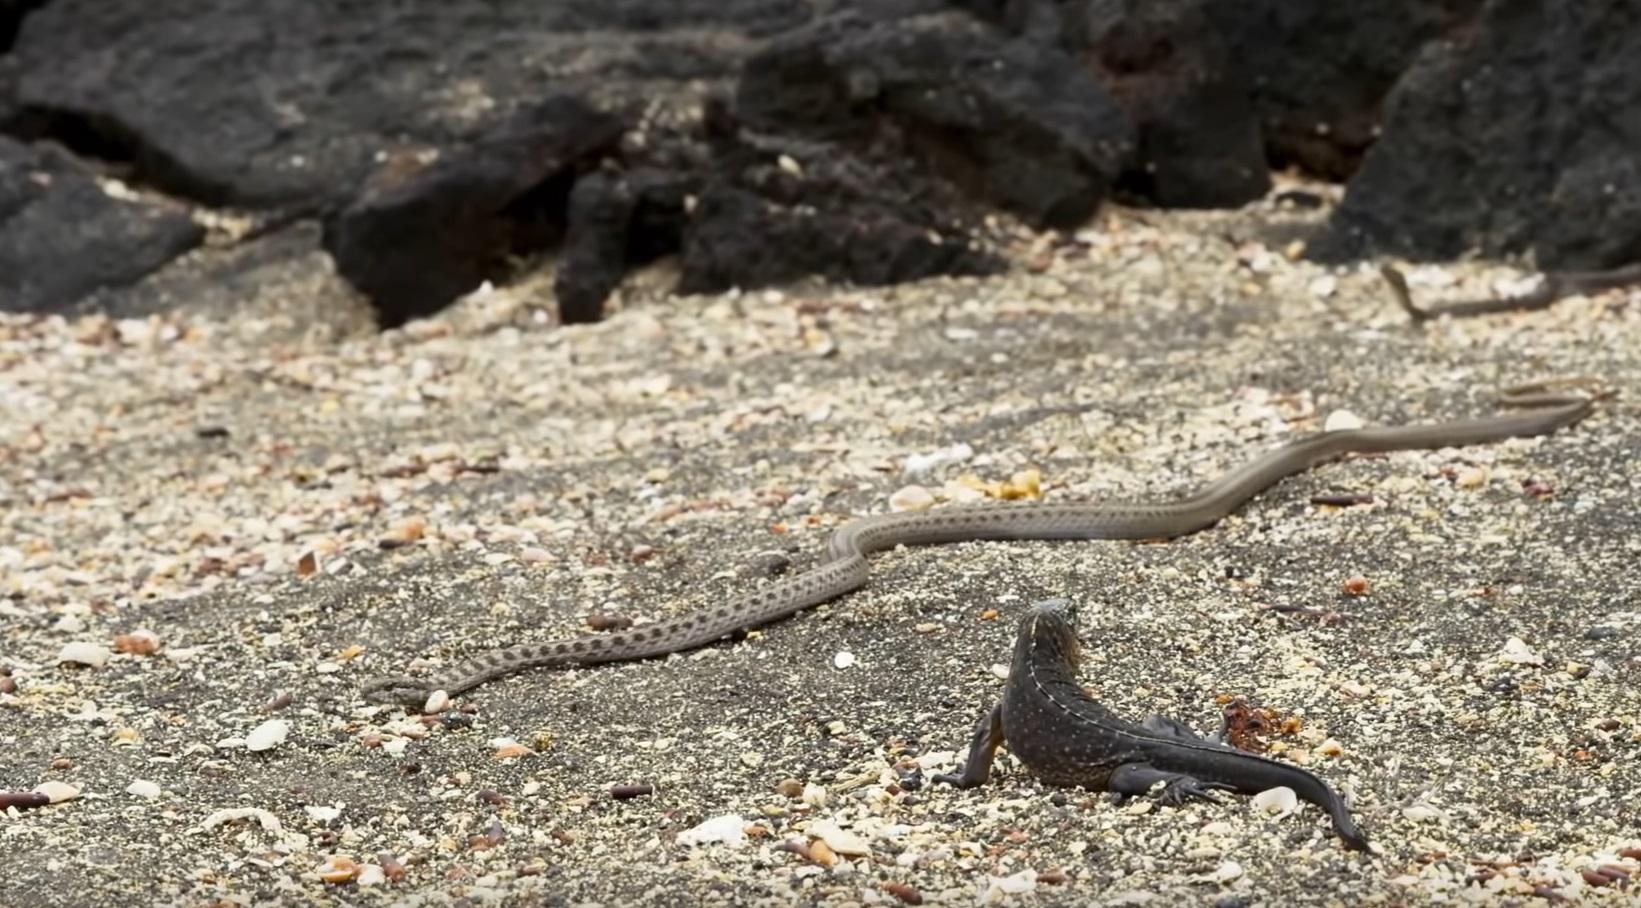 Iguana Vs Snakes